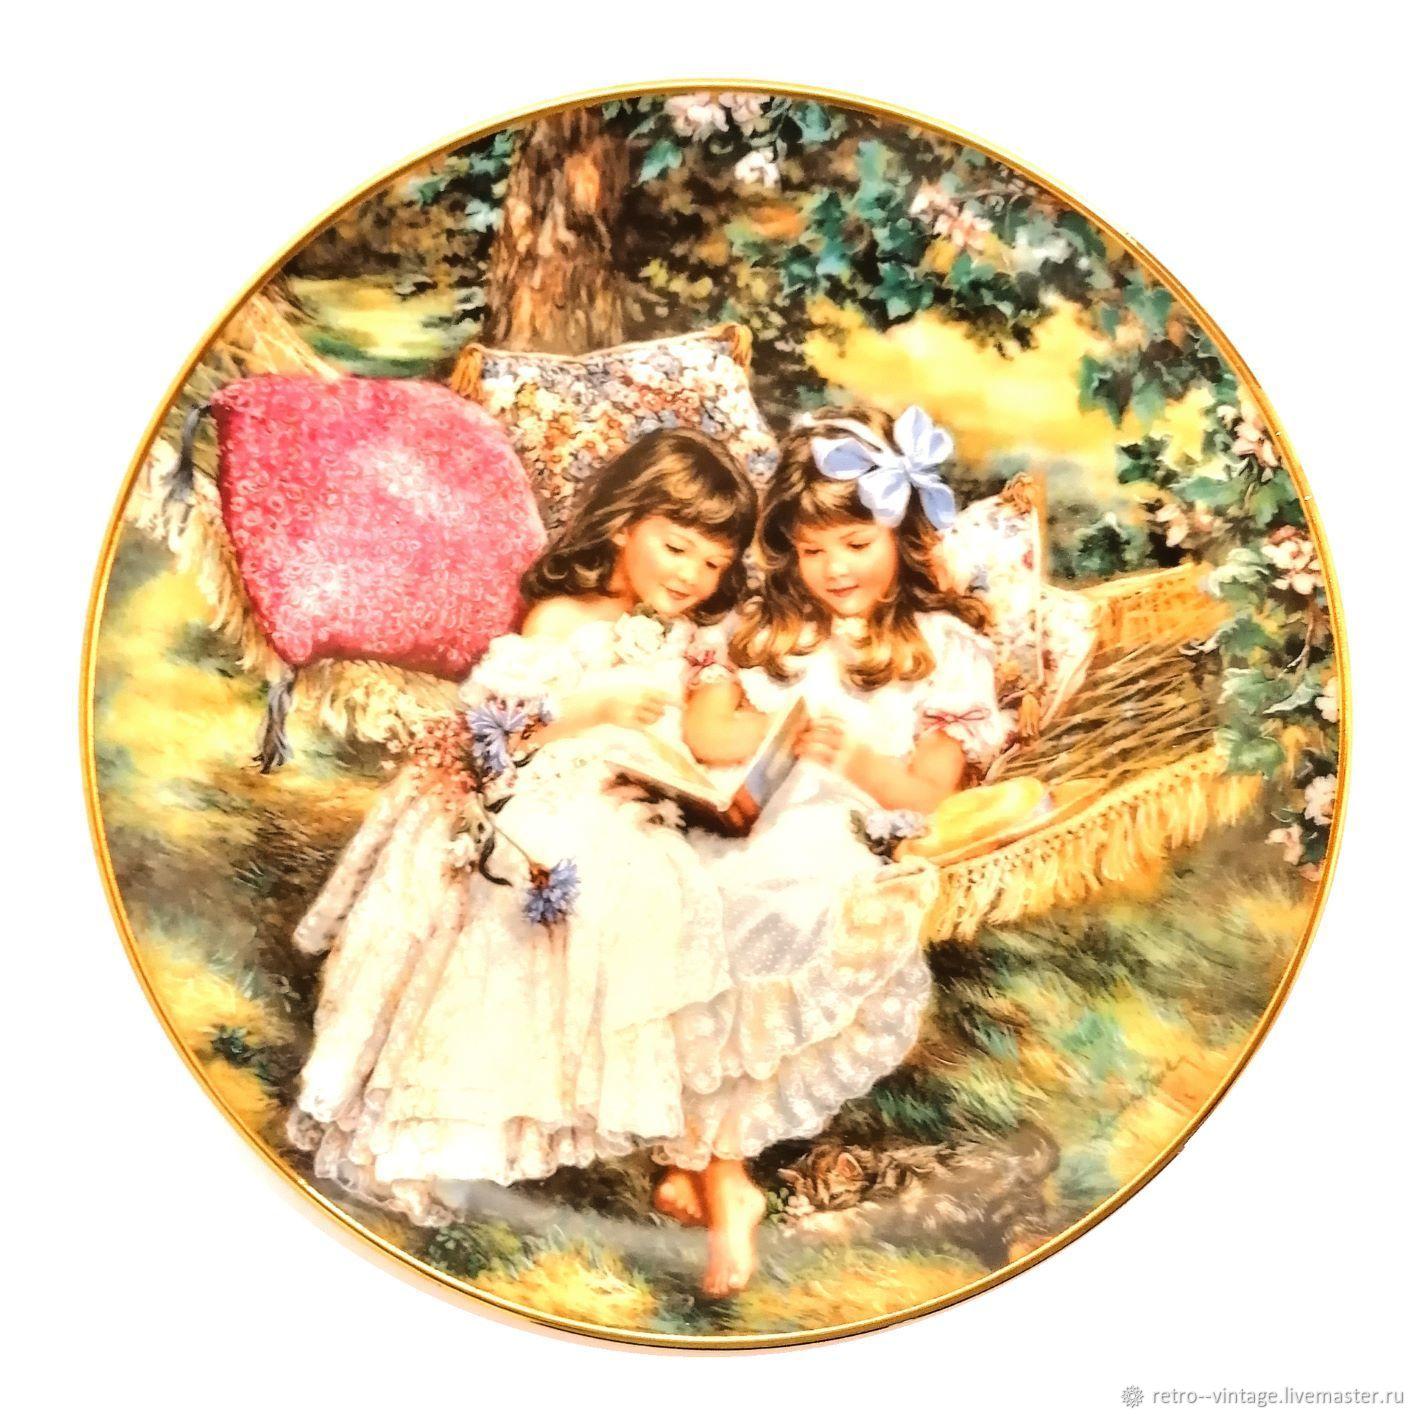 Porcelain/ decorative/wall plate, 1991, America, Vintage plates, Munster,  Фото №1